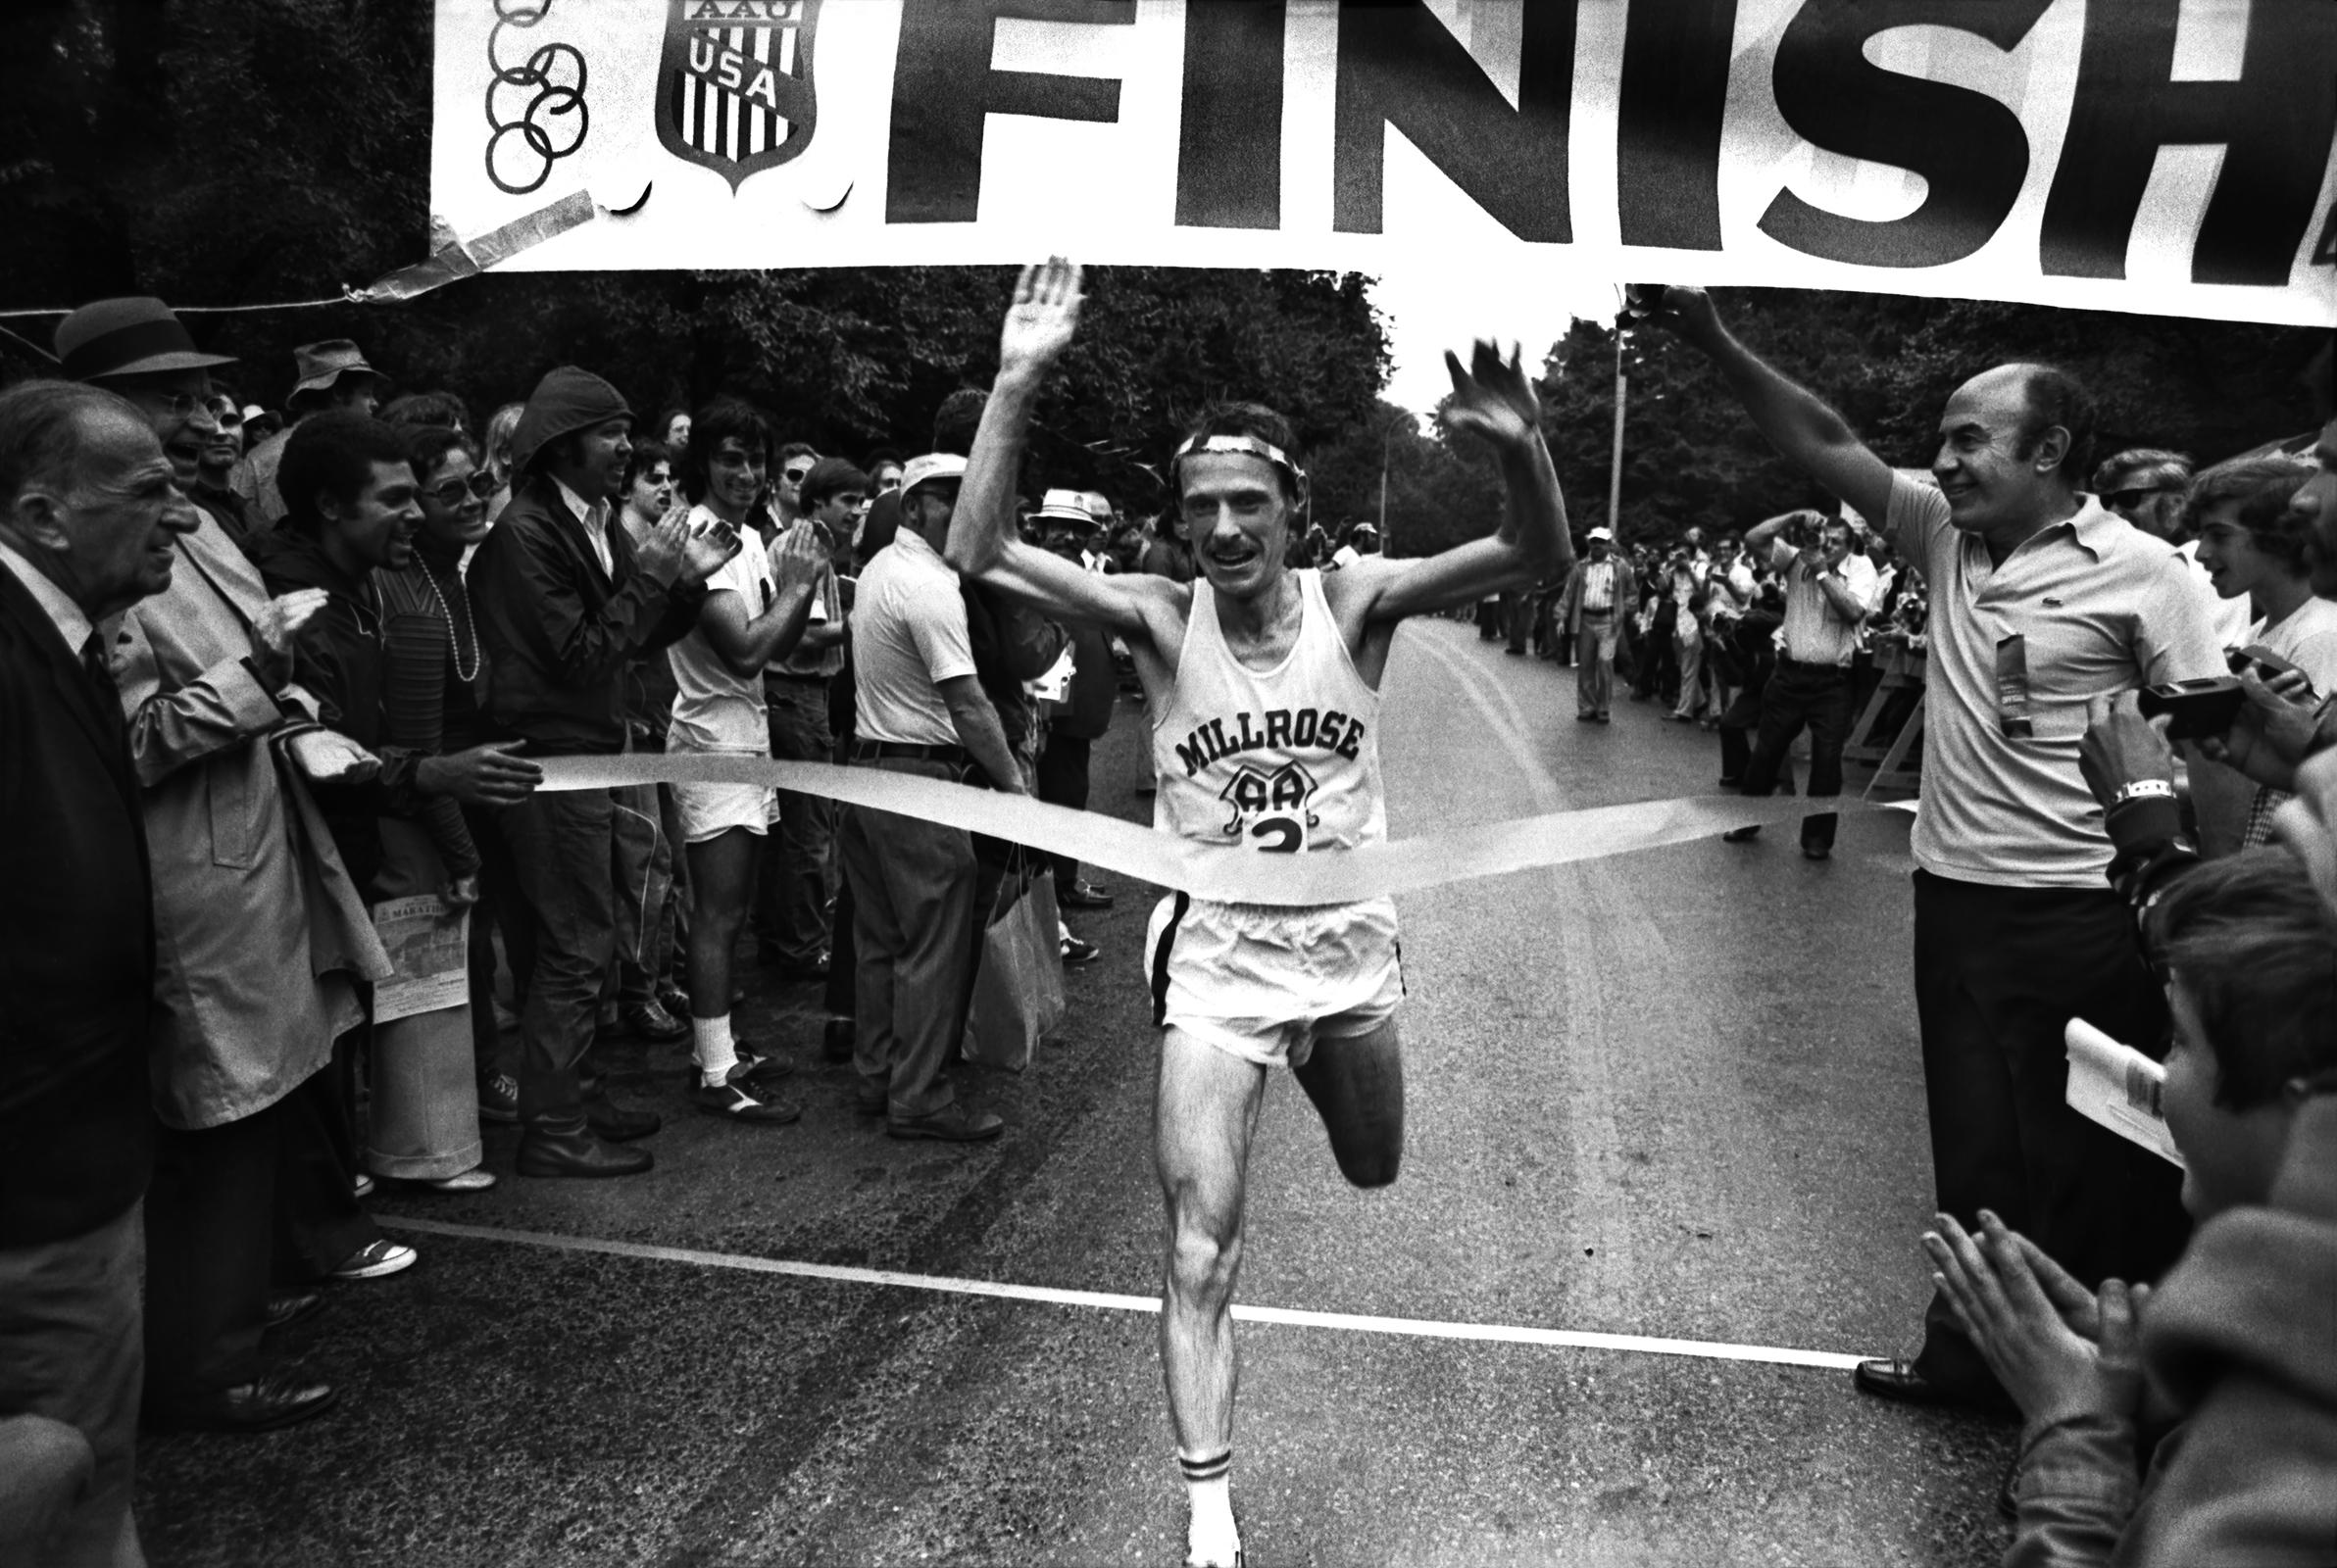 norbert sander winning the NYC marathon, 1974